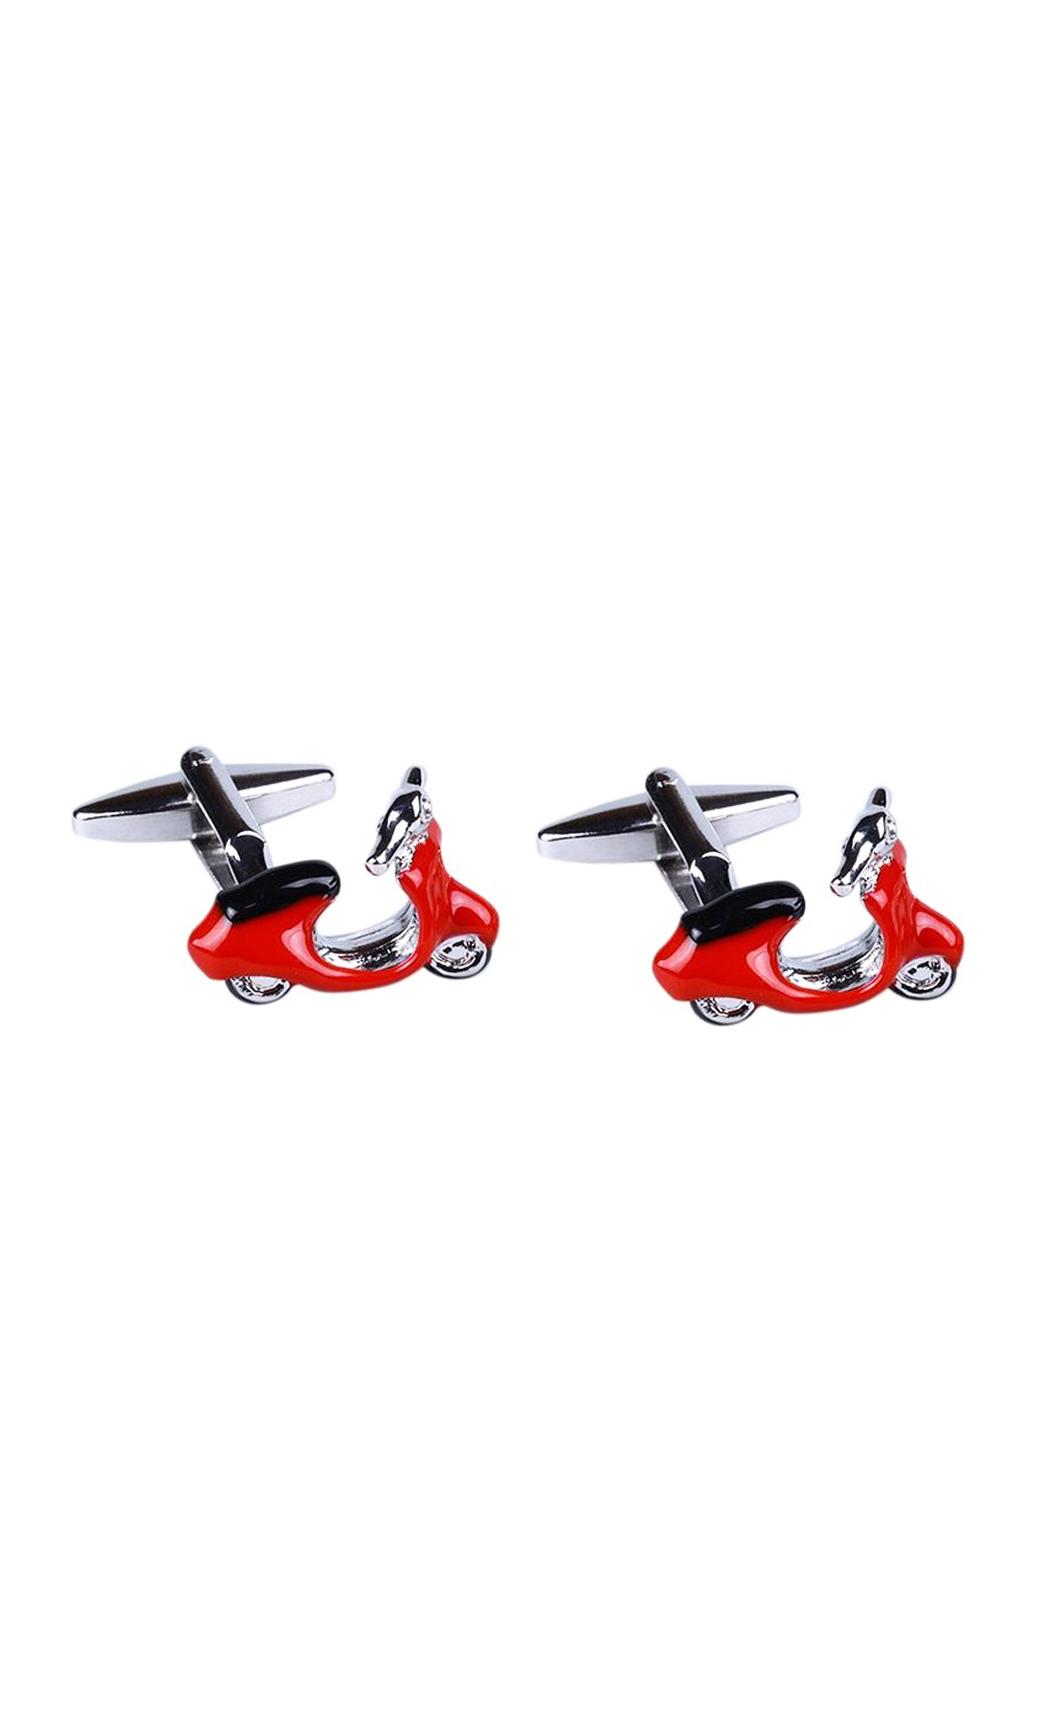 Rosette Metallic Red Scooter Cufflink. Buy Online